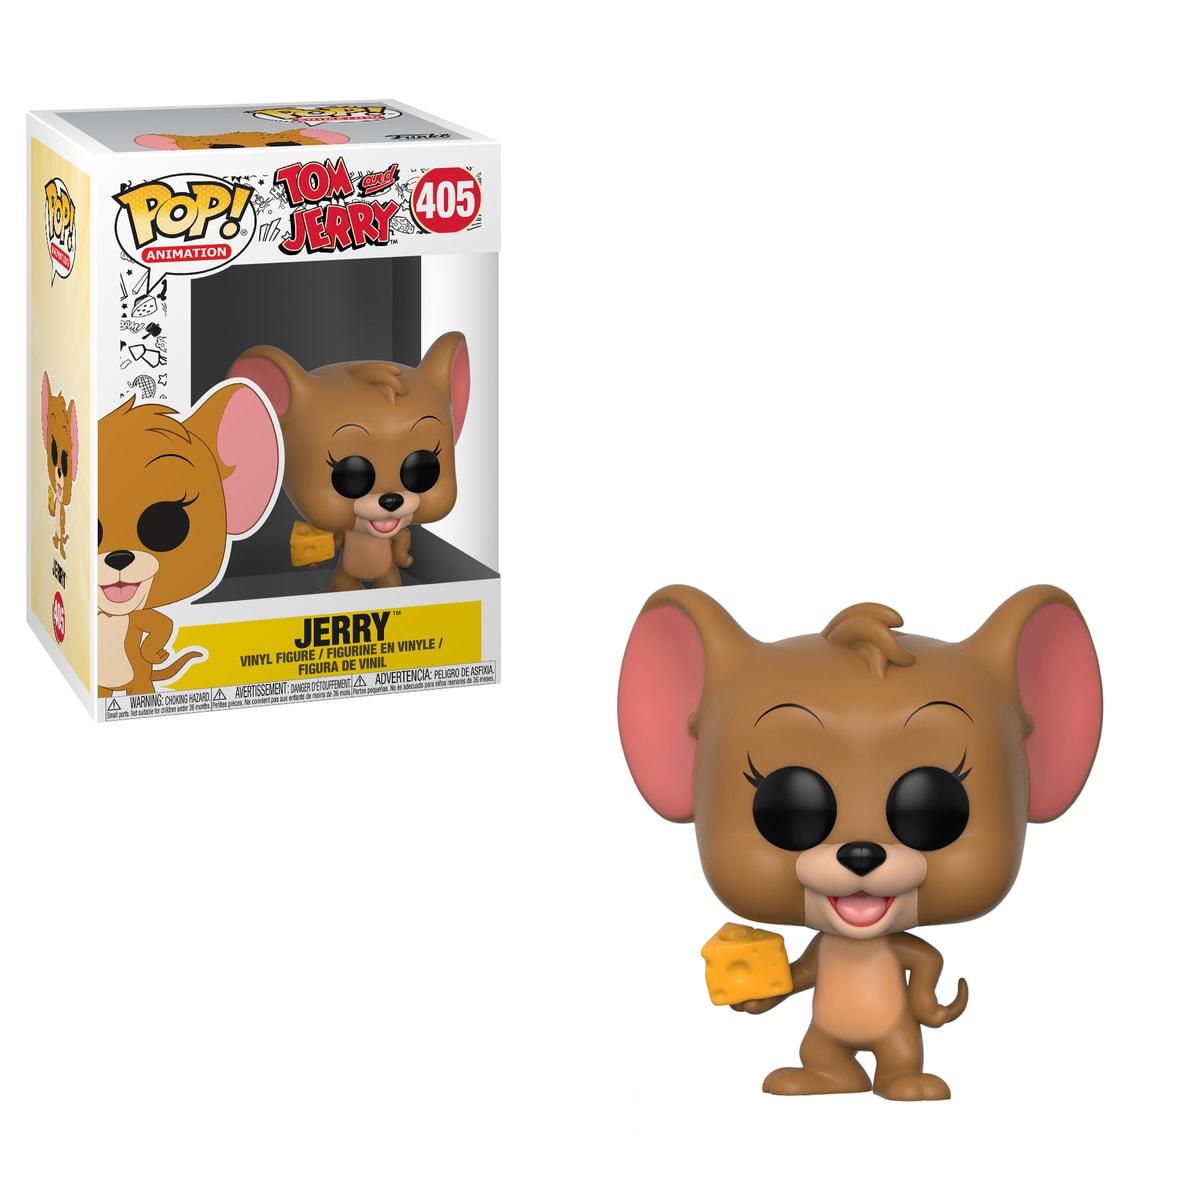 Funko POP: Hanna Barbera Tom & Jerry Jerry